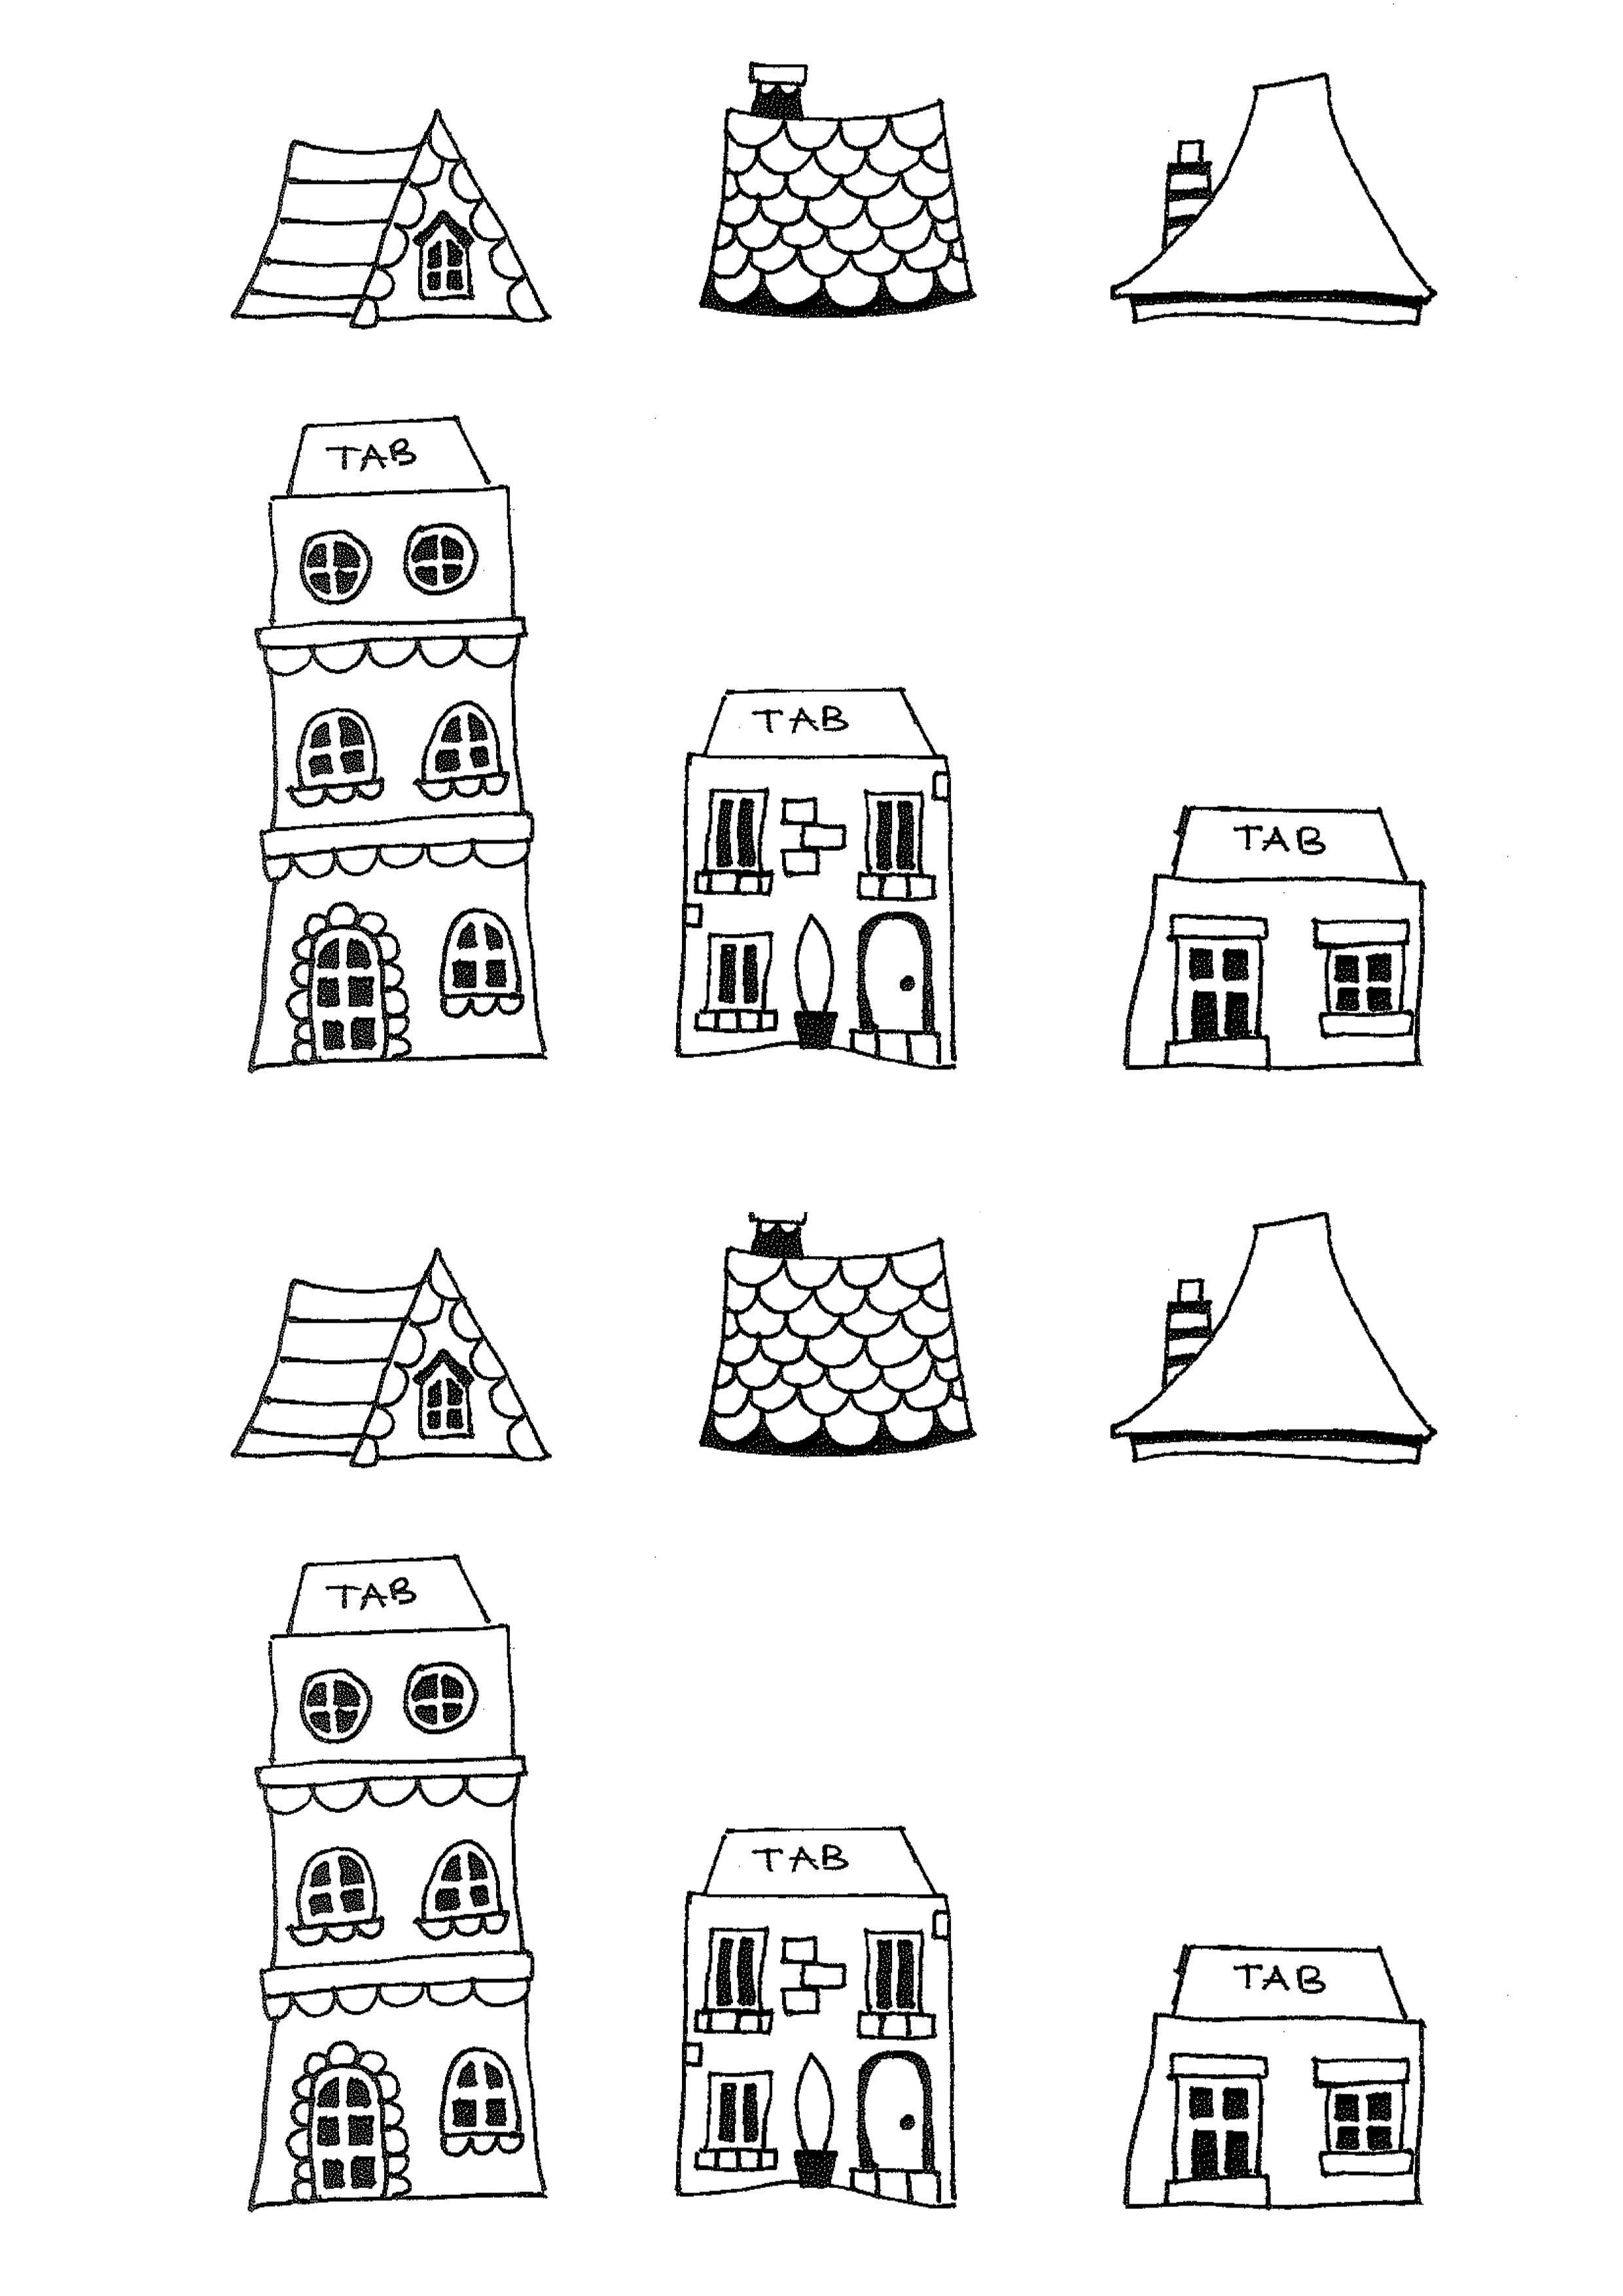 Free Printable House Templates   Printables   New Home Cards, House - Free Printable Card Templates